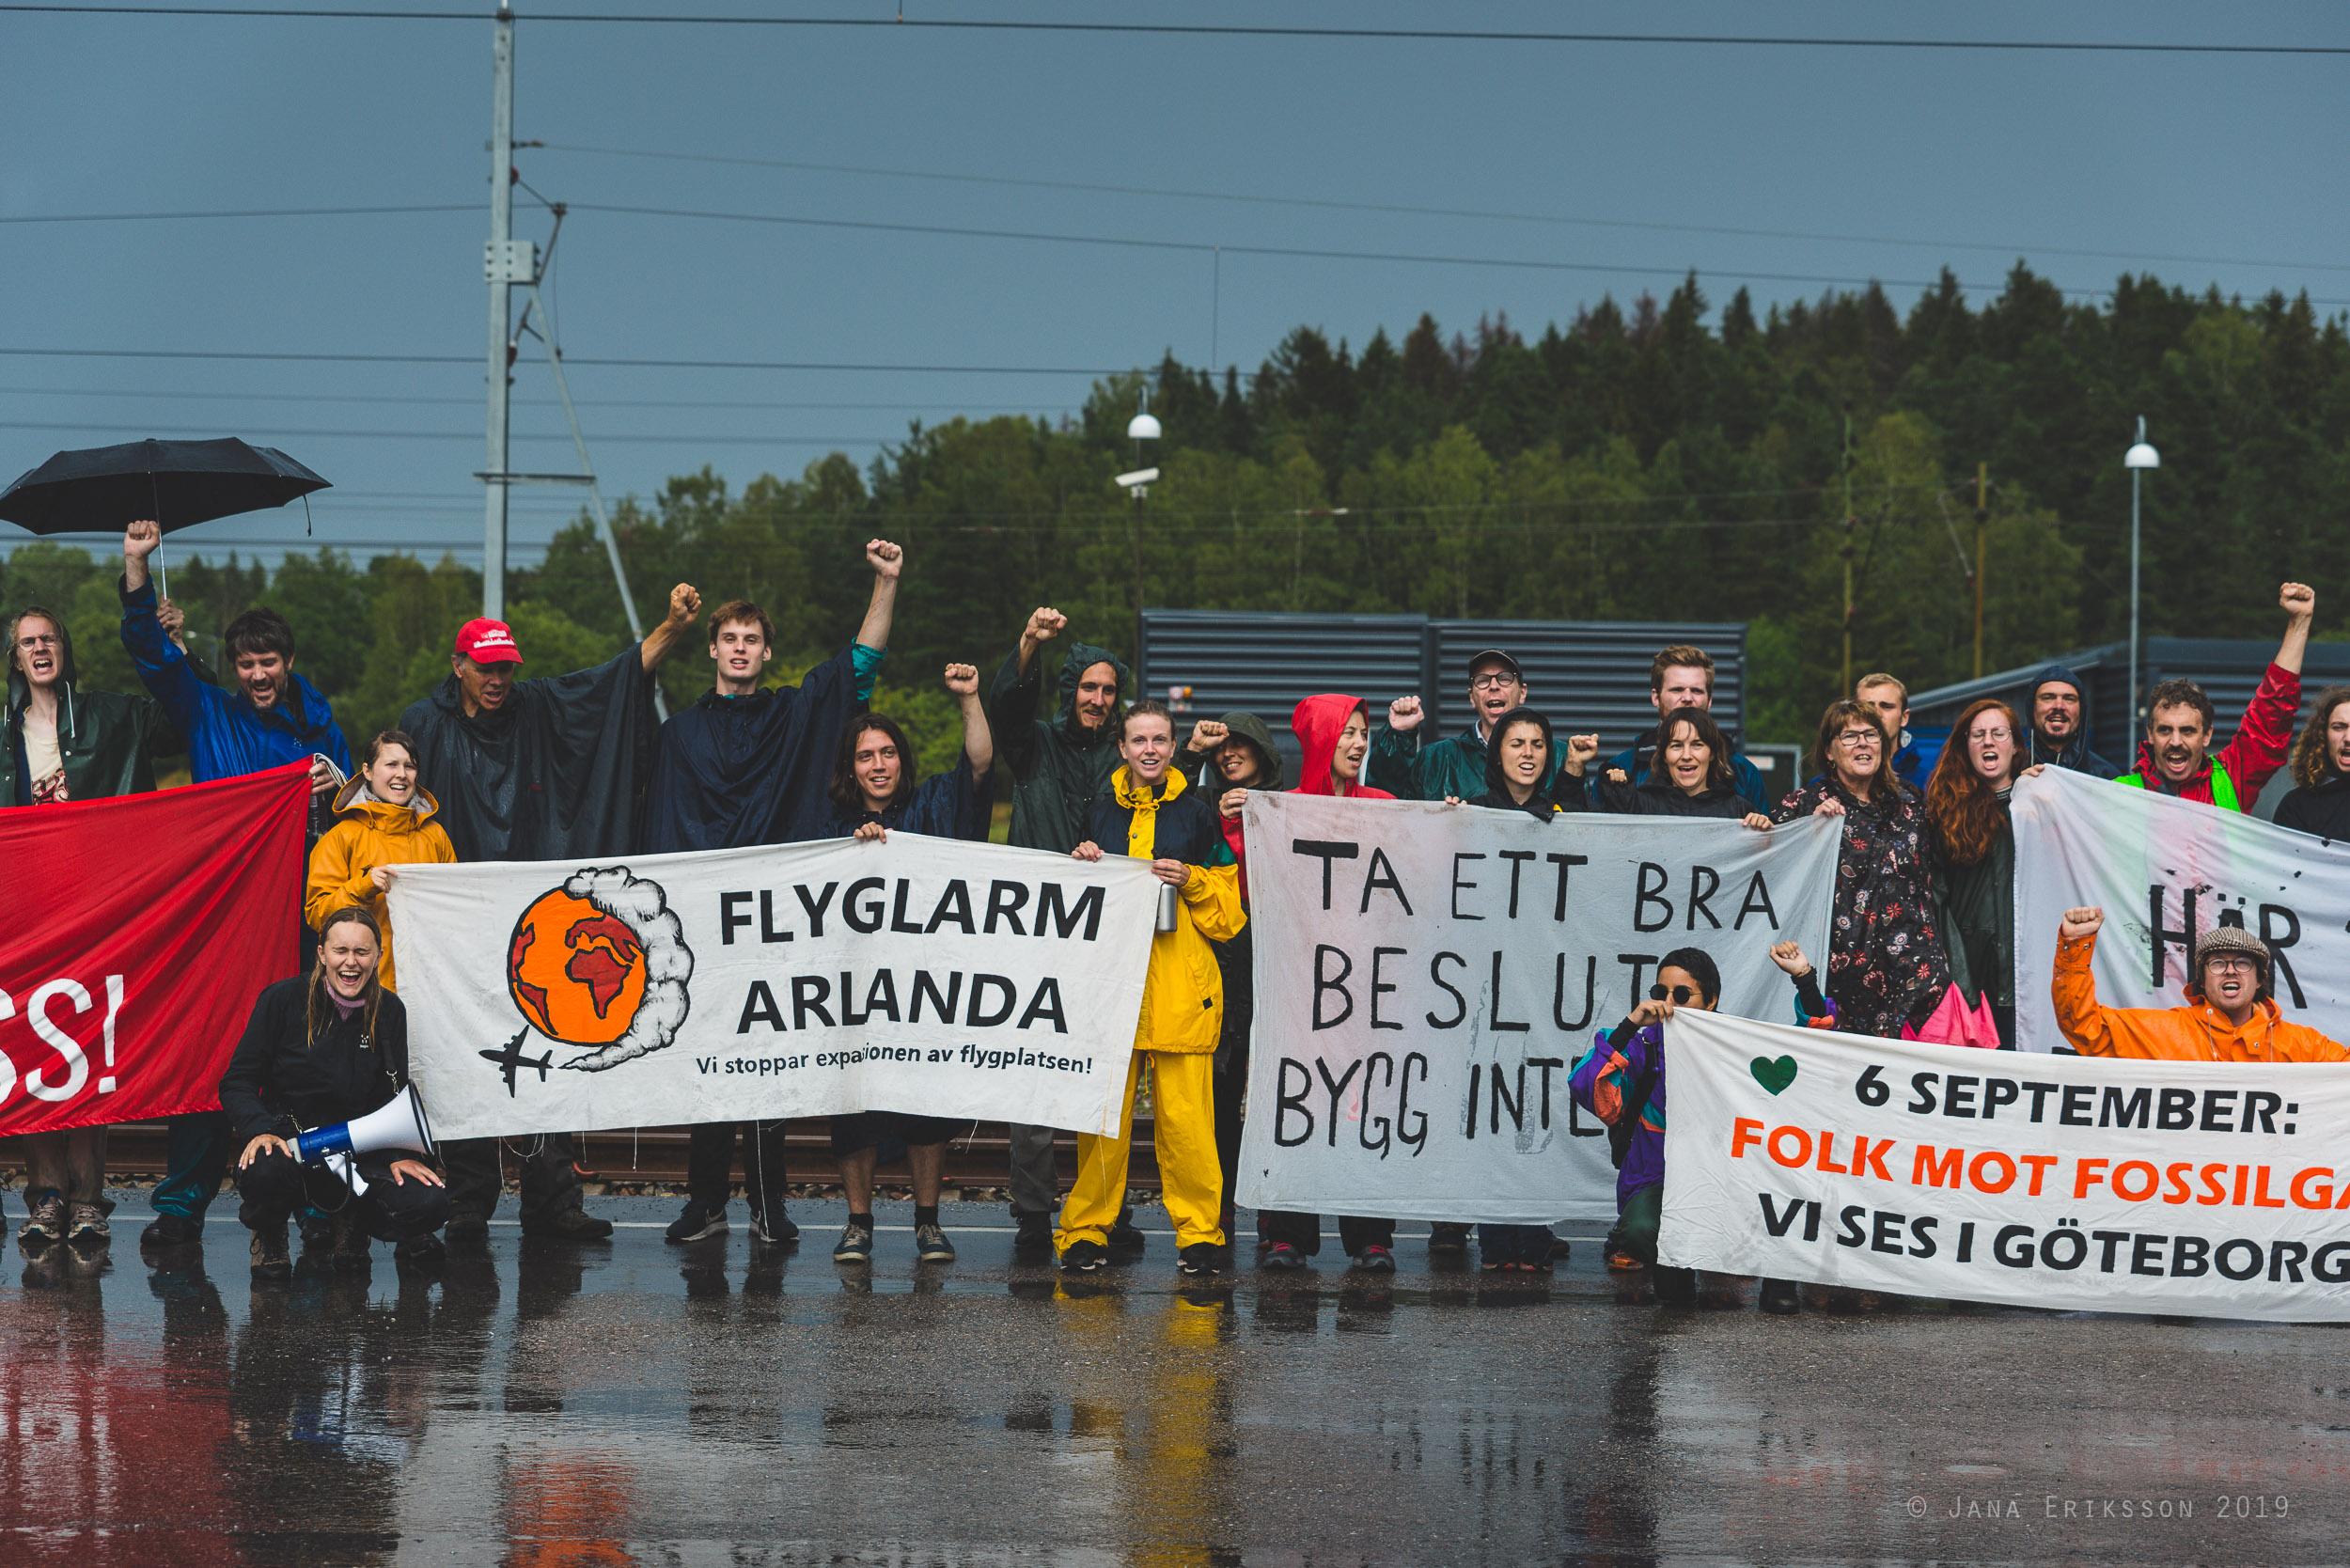 Flyglarm_arlanda_2019_jana_eriksson-0216